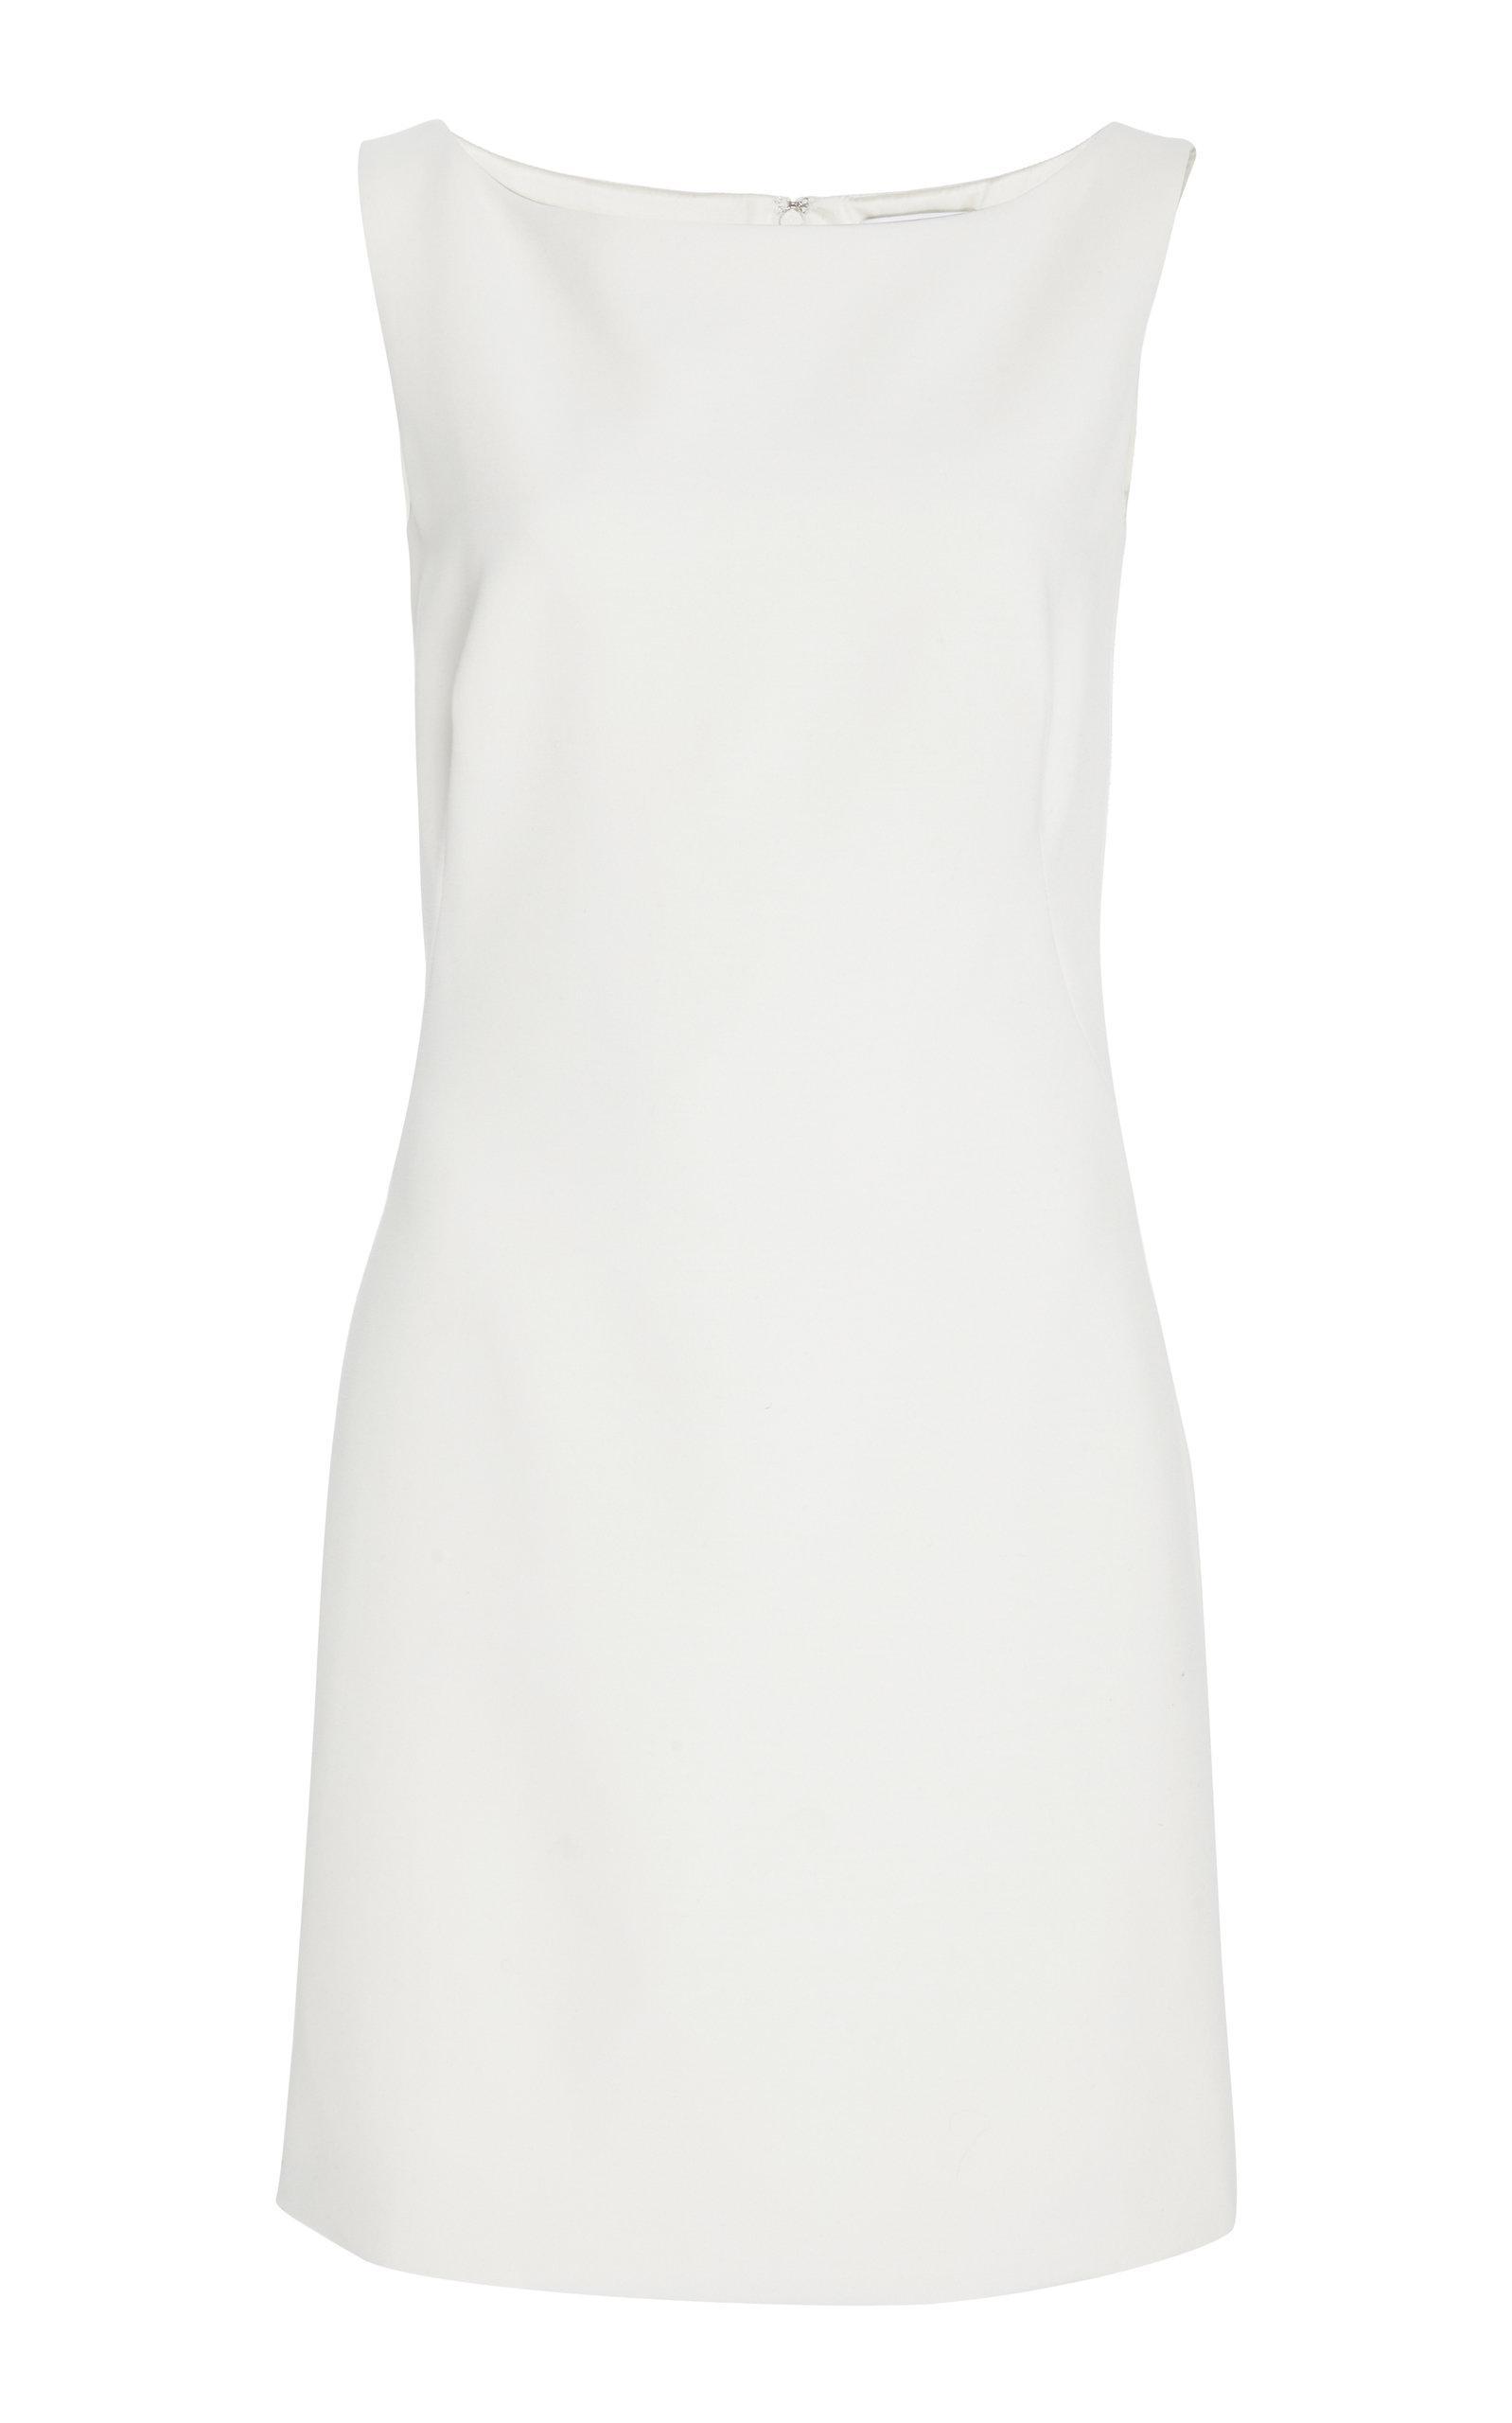 Pamella Roland Sheath Shift Dress In White